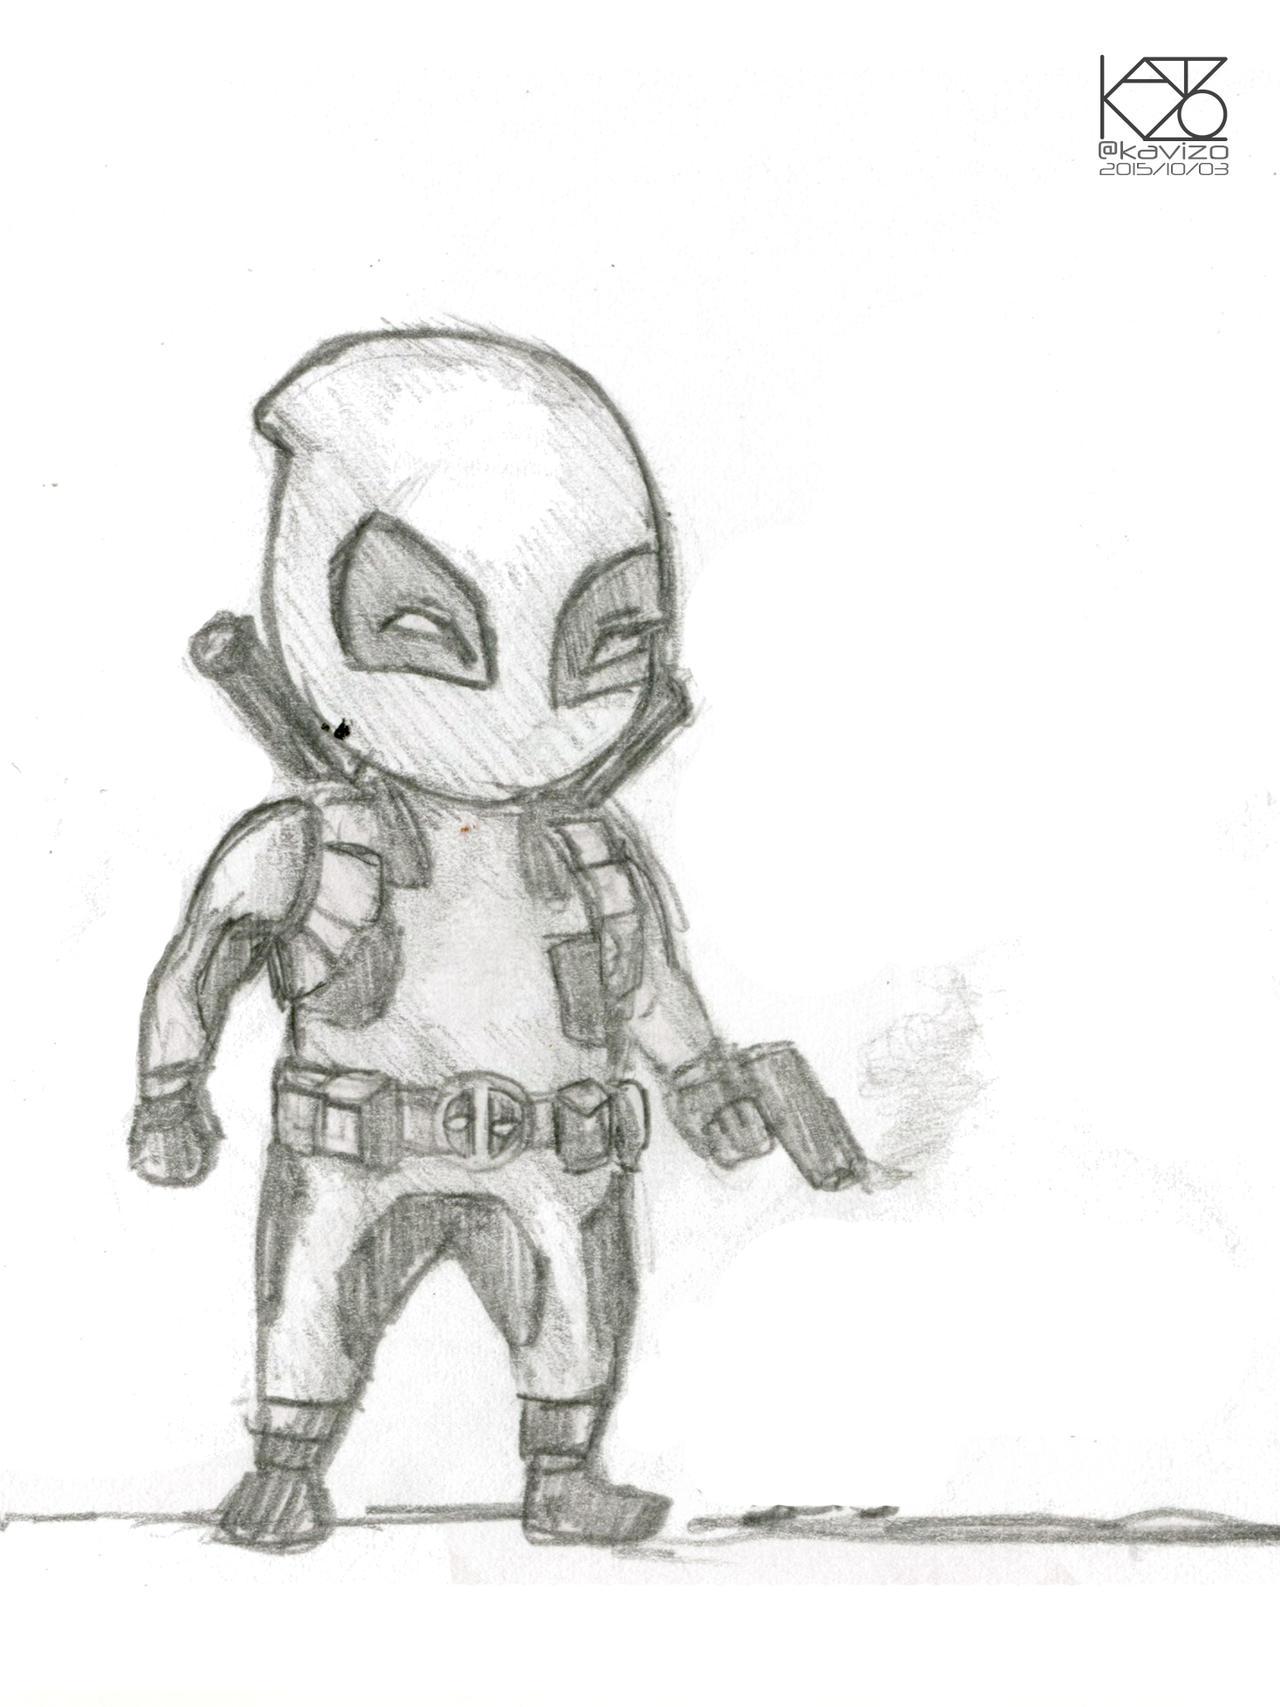 Deadpool Chibi Sketch By Kavizo By KAVIZO On DeviantArt